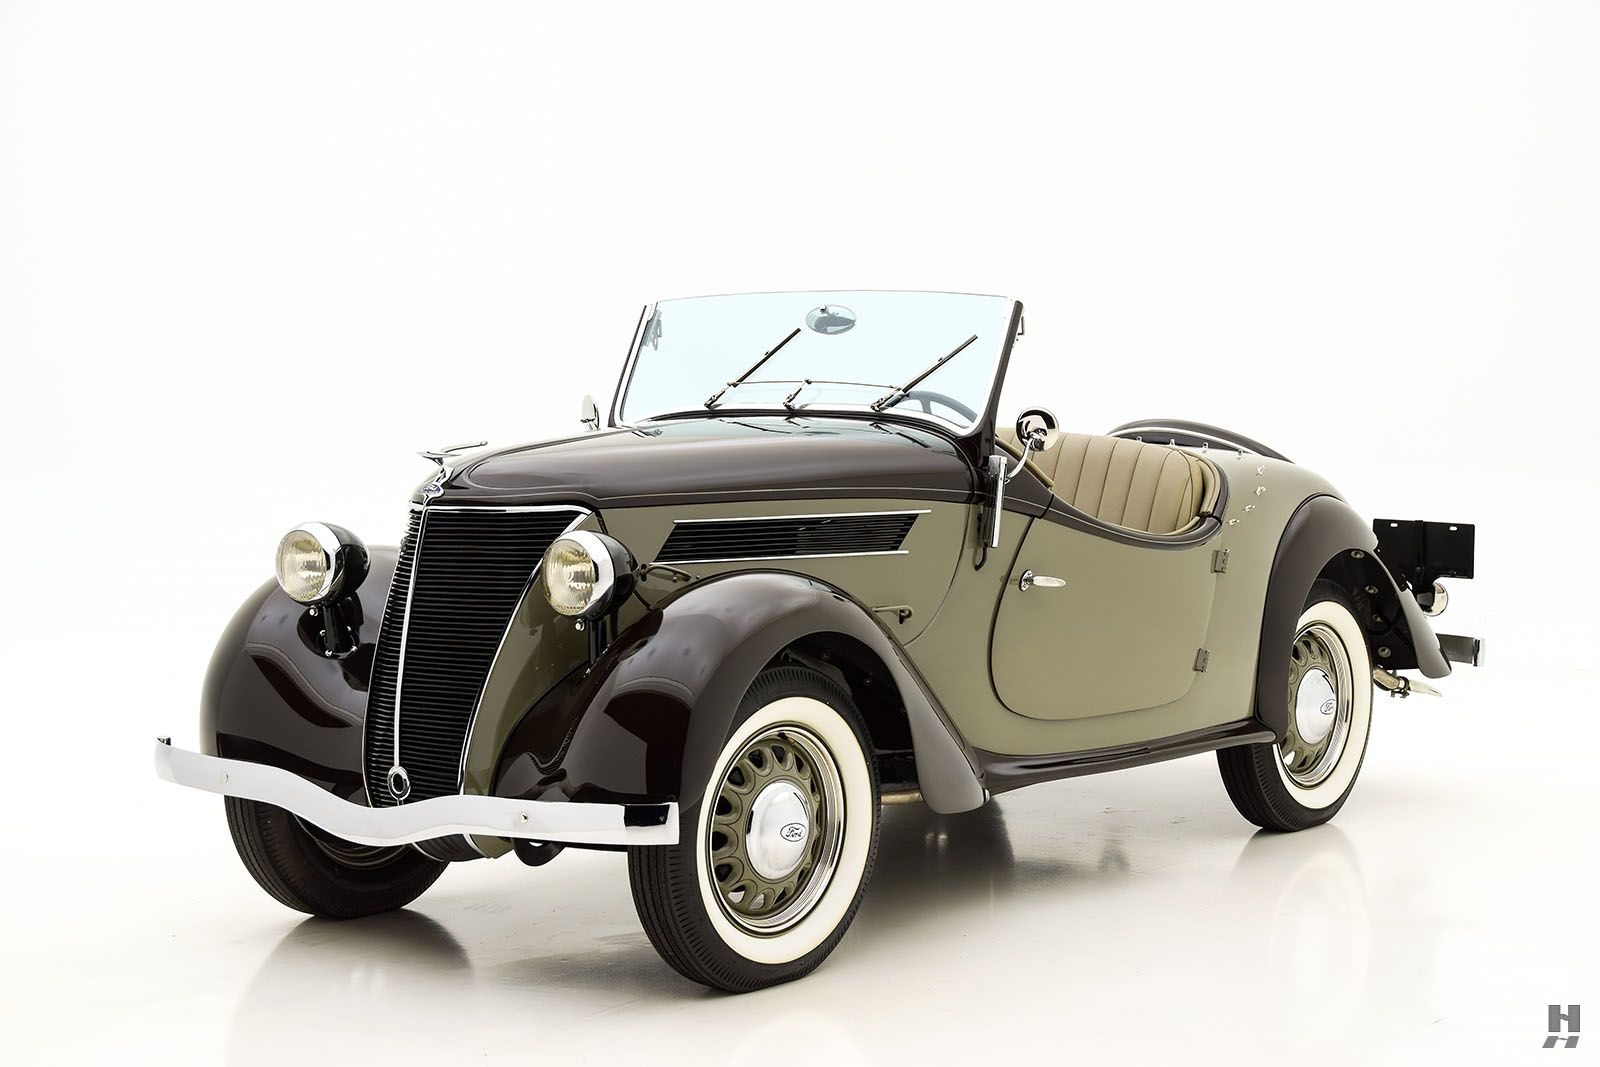 1937 Ford Eifel Retro Cars Ford Antique Cars